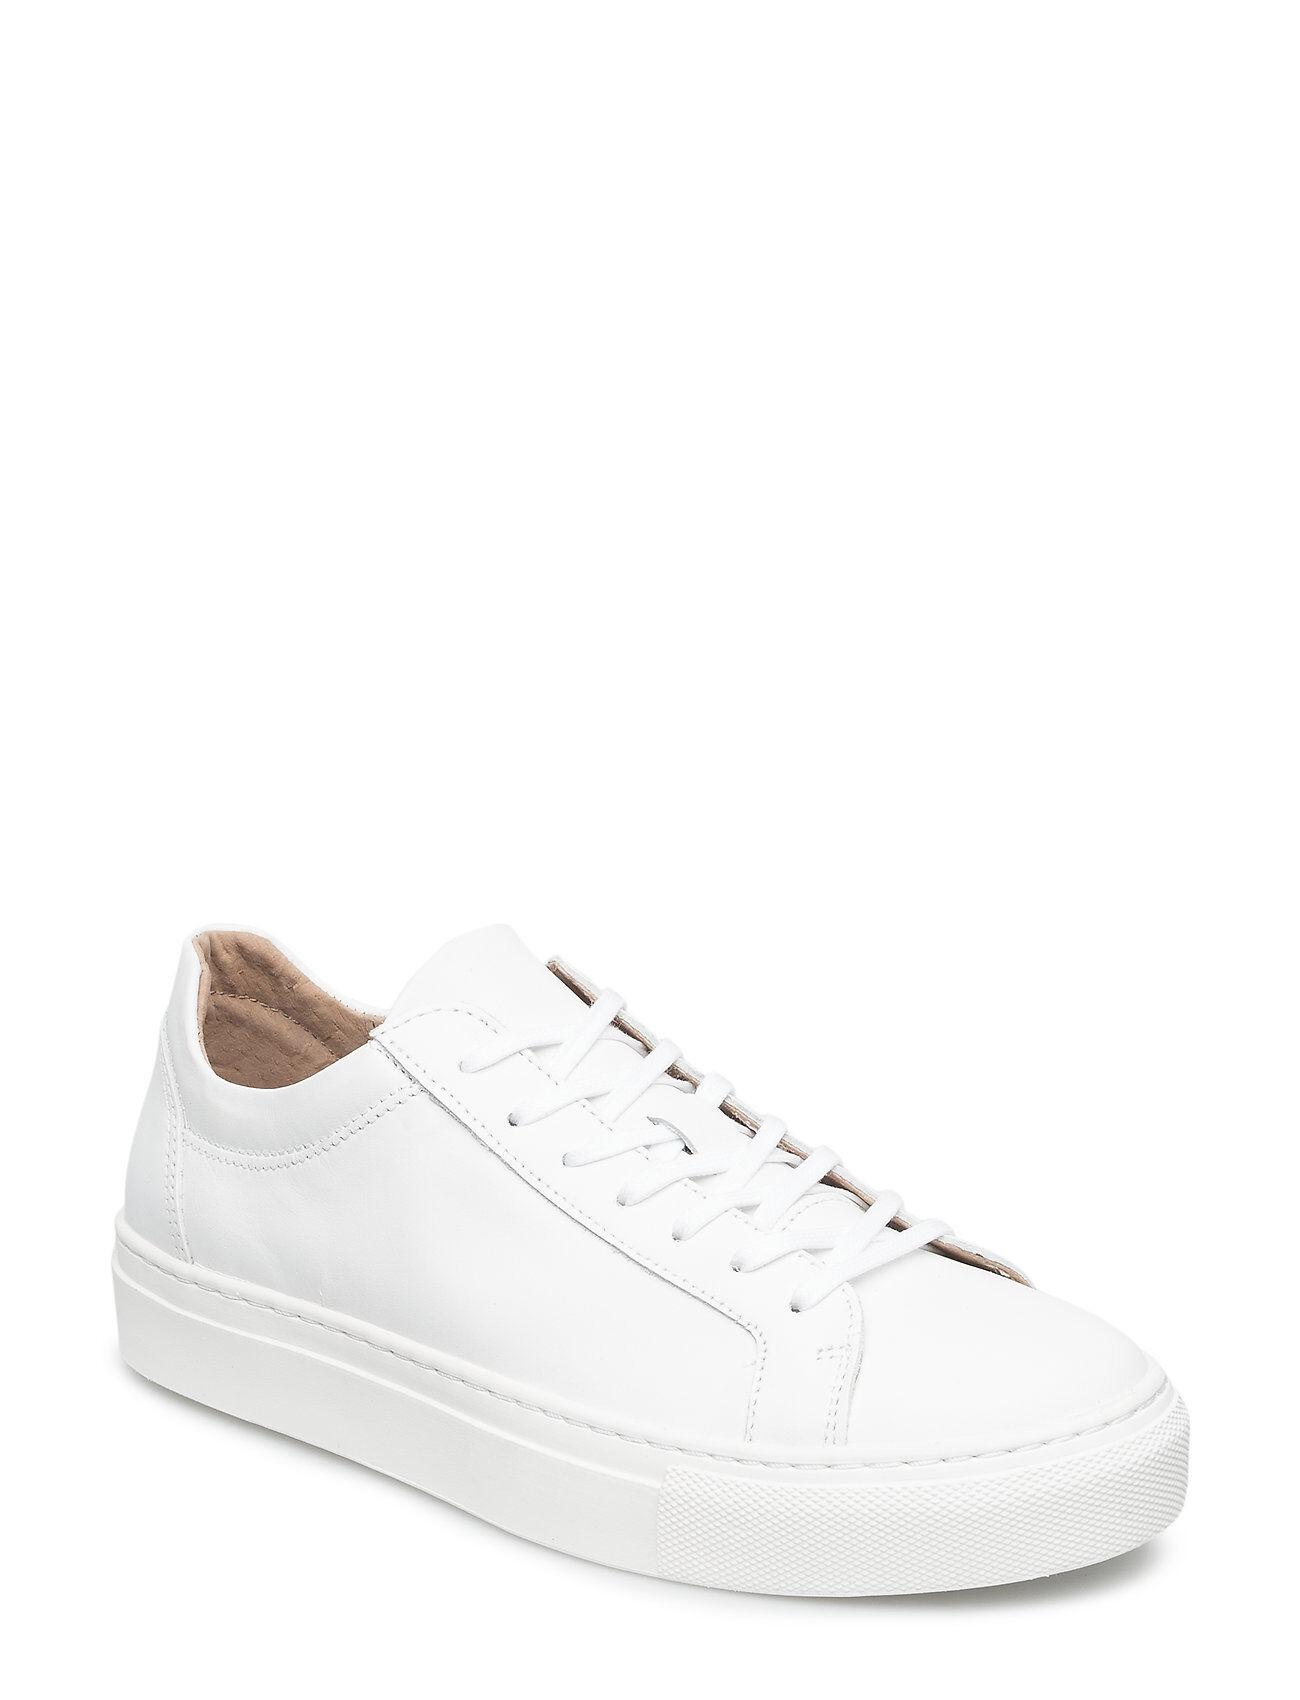 Selected Femme Sfdonna Sneaker Noos Matalavartiset Sneakerit Tennarit Valkoinen Selected Femme